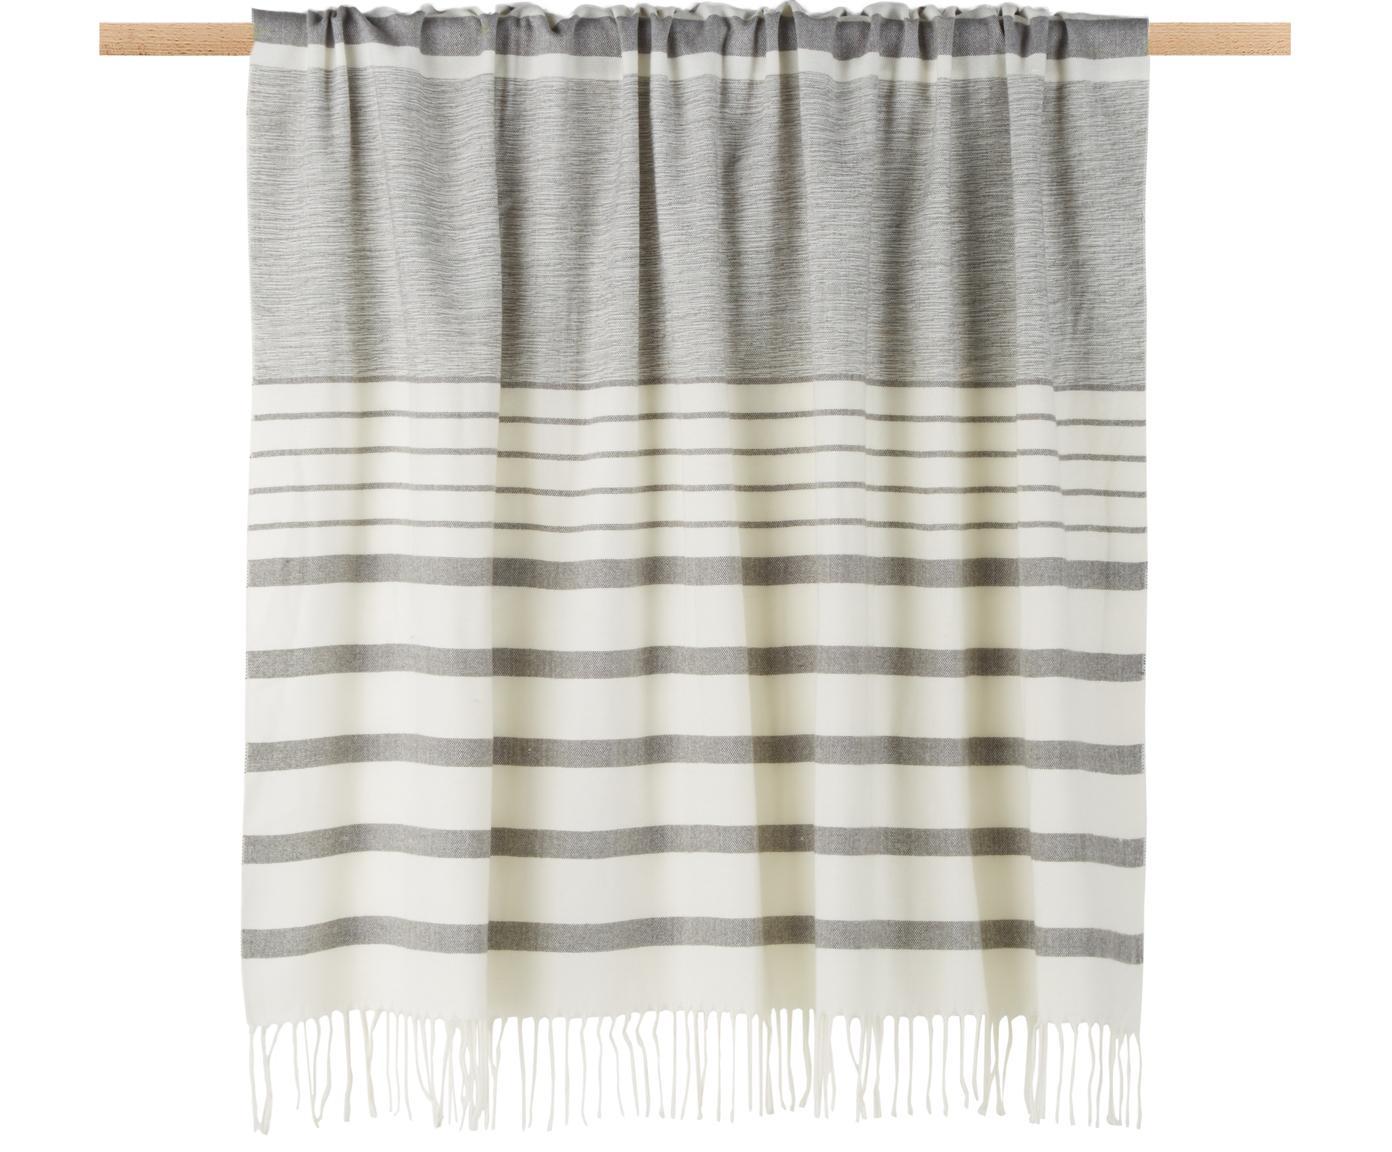 Plaid Hamam, 100% Acryl, Grau, Weiss, 130 x 170 cm